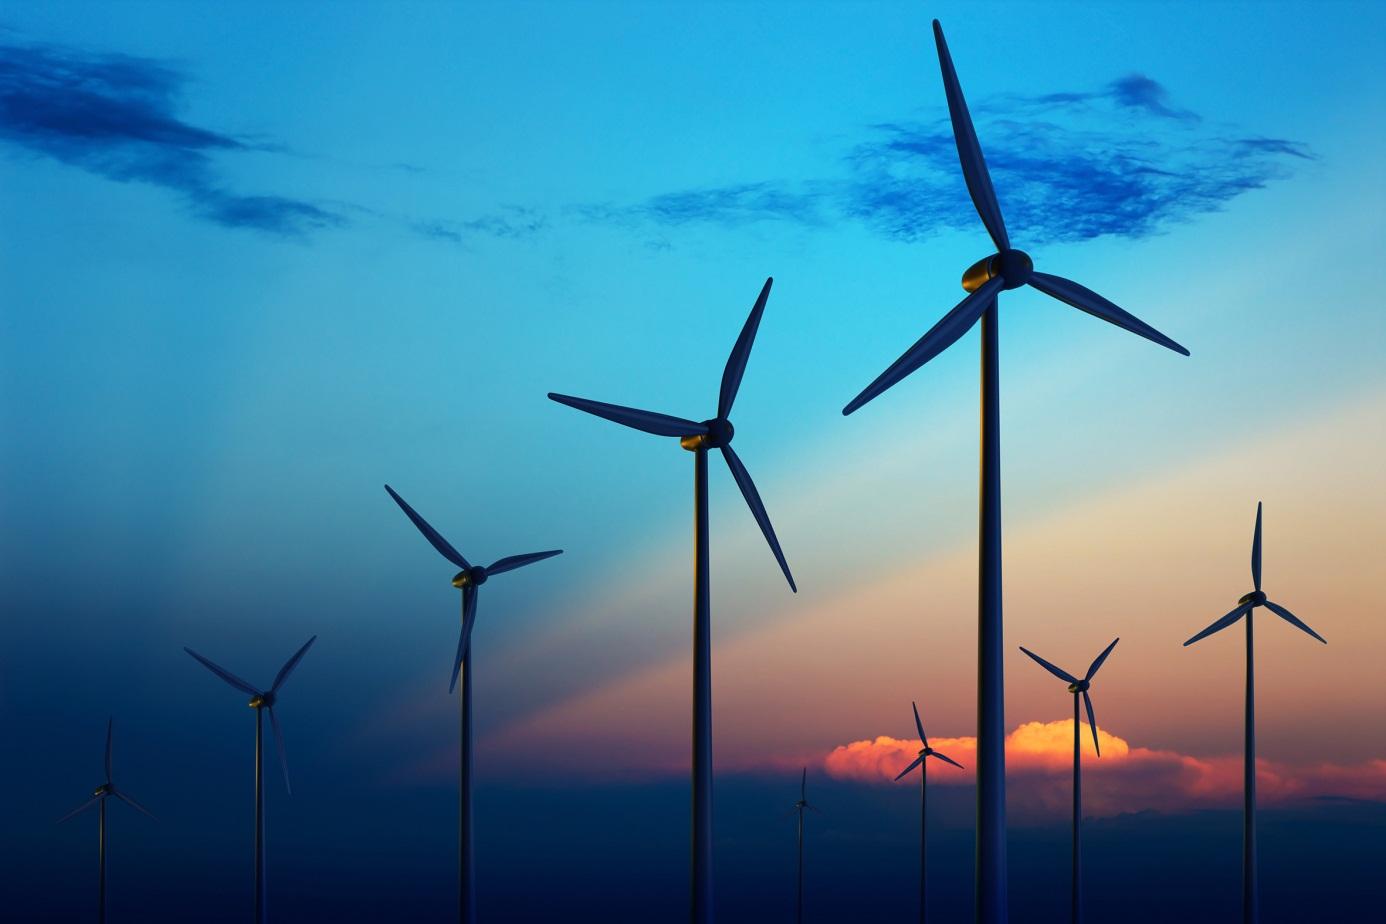 Eolic energy, a photo from Leiria, North | TrekEarth